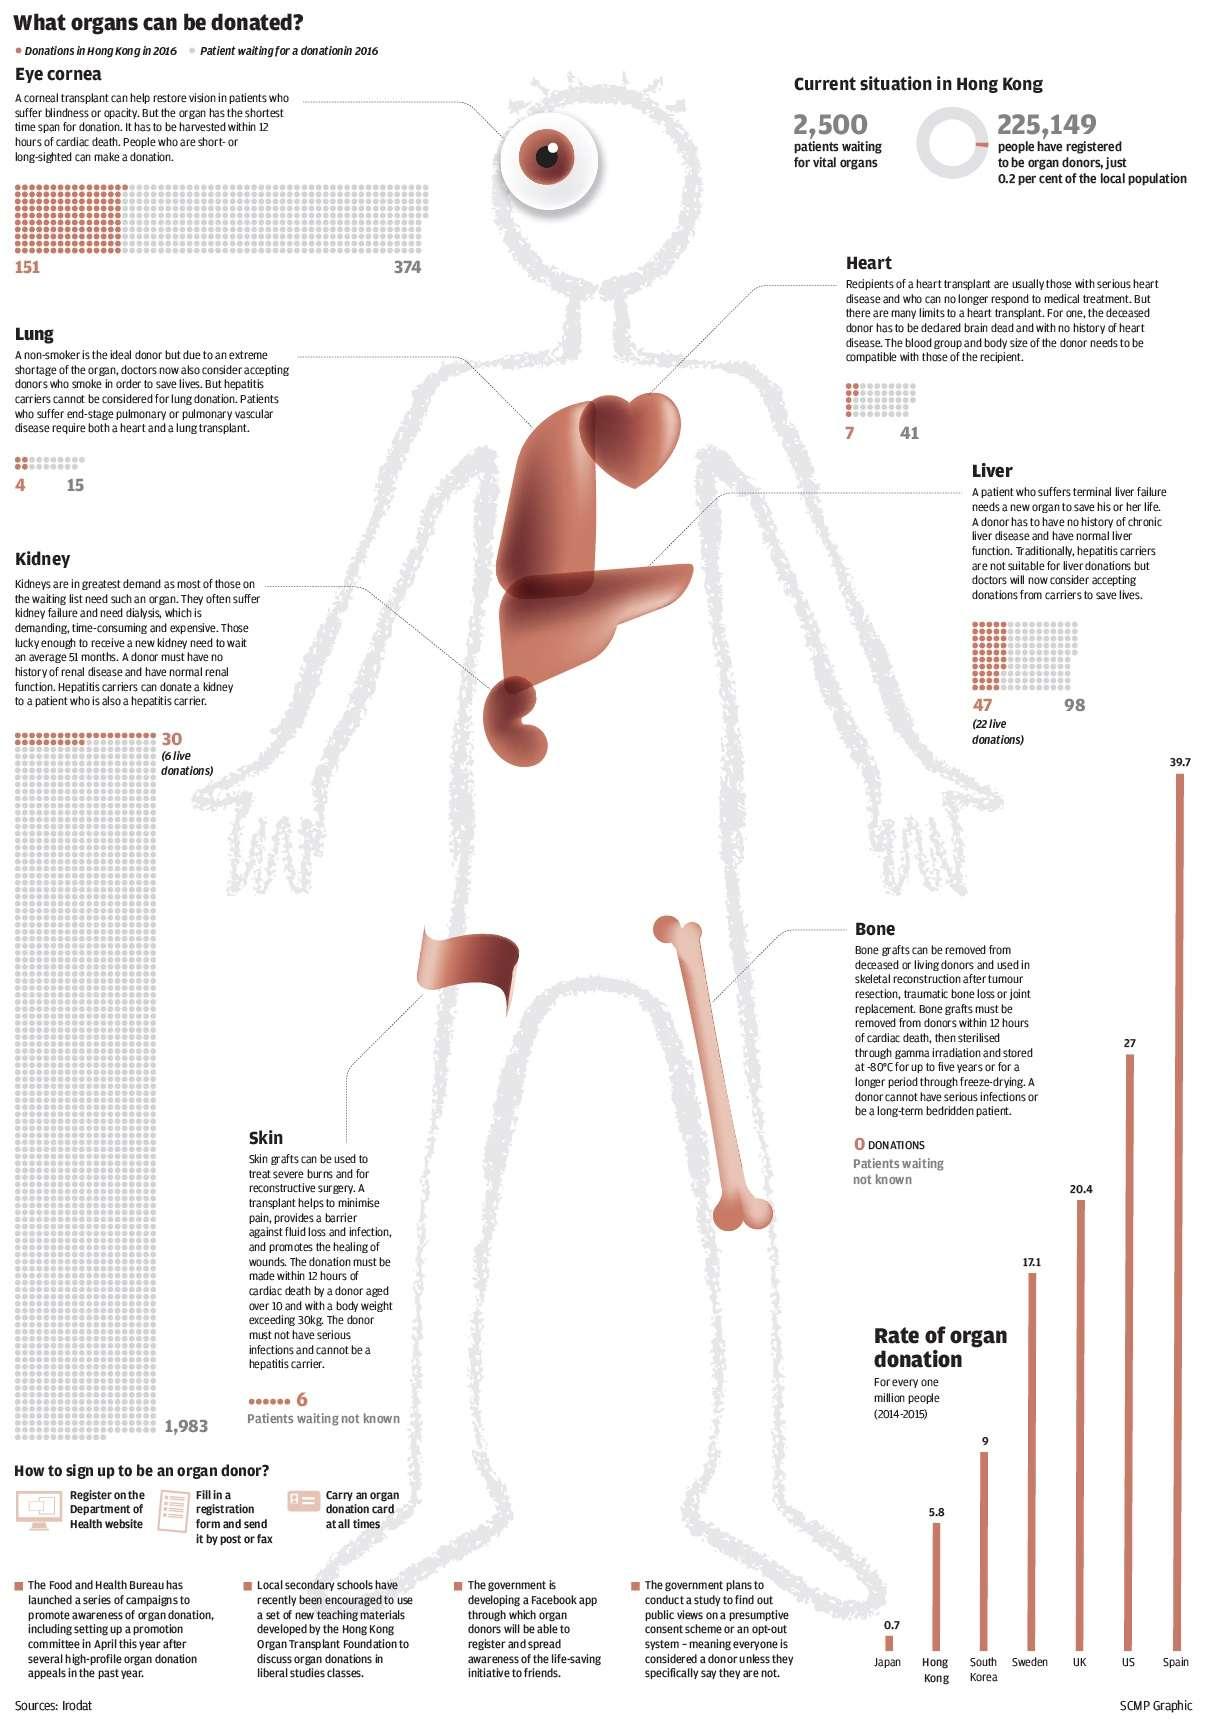 a study on organ transplants